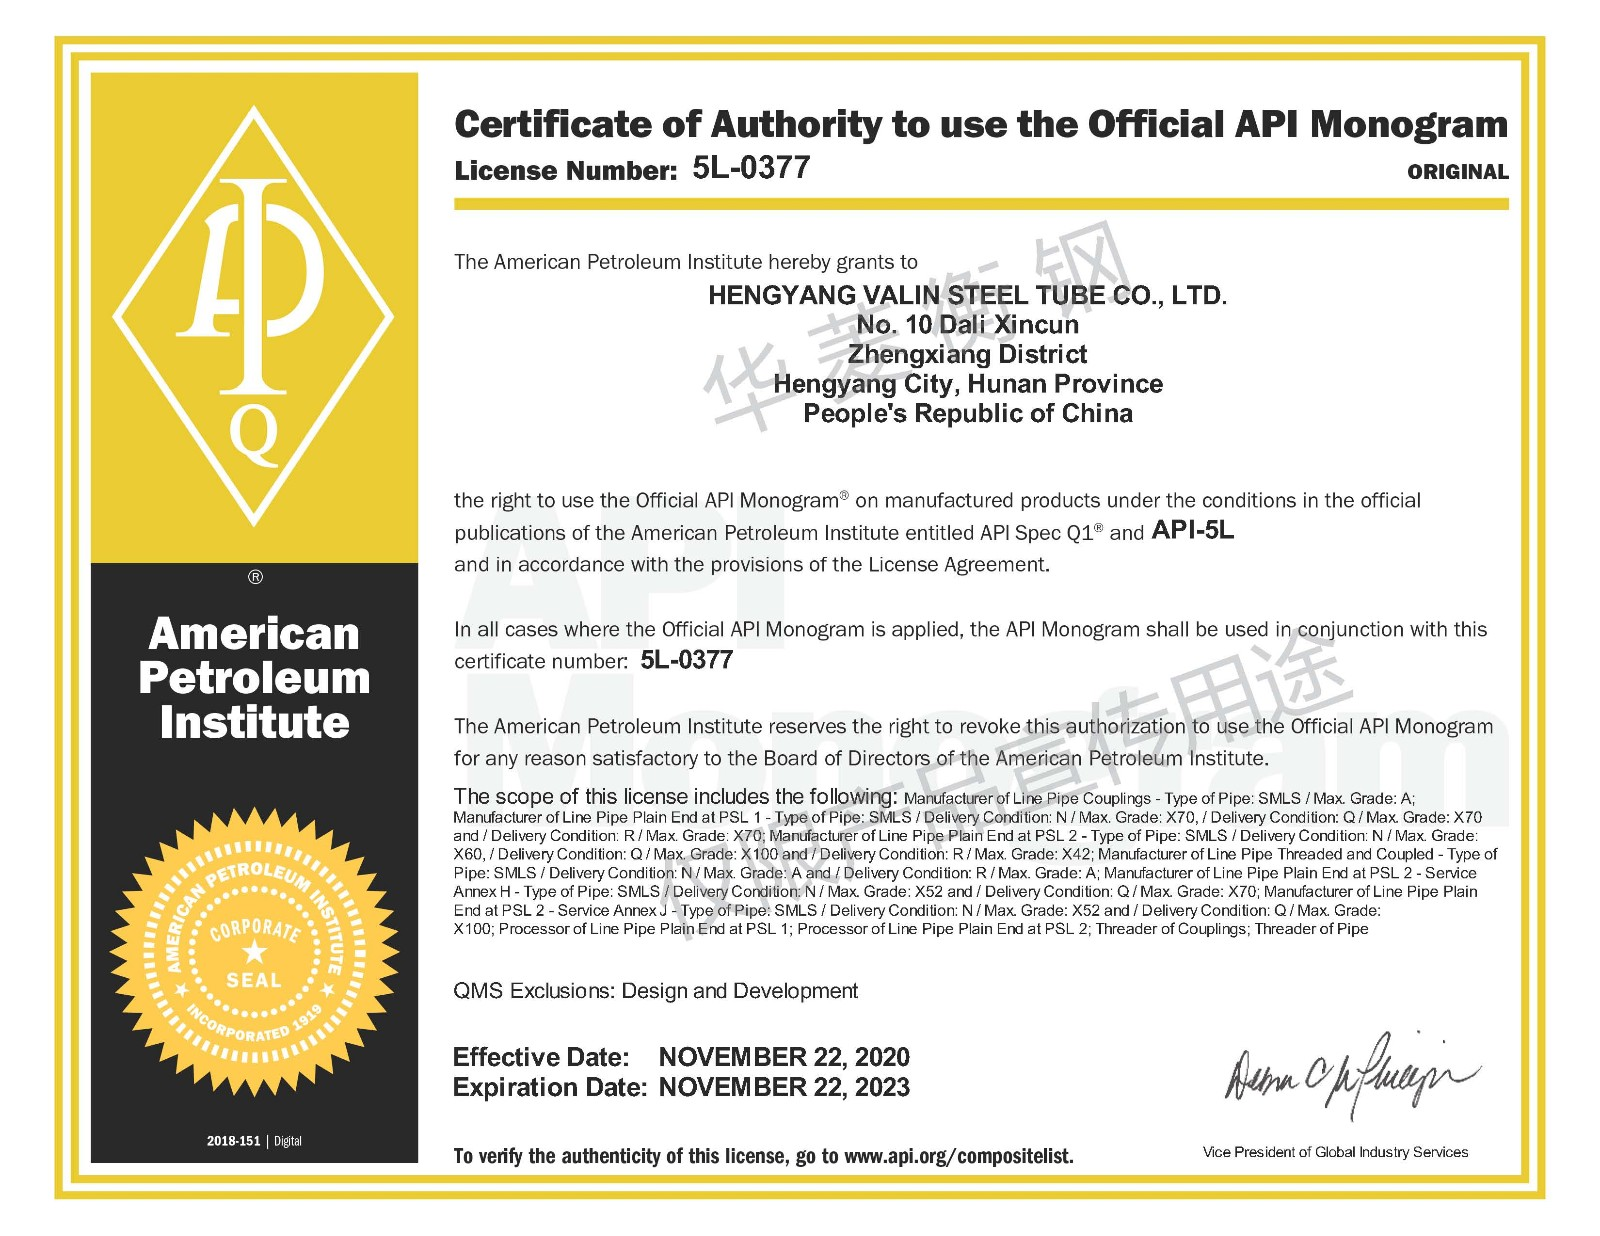 +Certificate 5L-0377_20201130165529_PDFRemovePassword.jpg